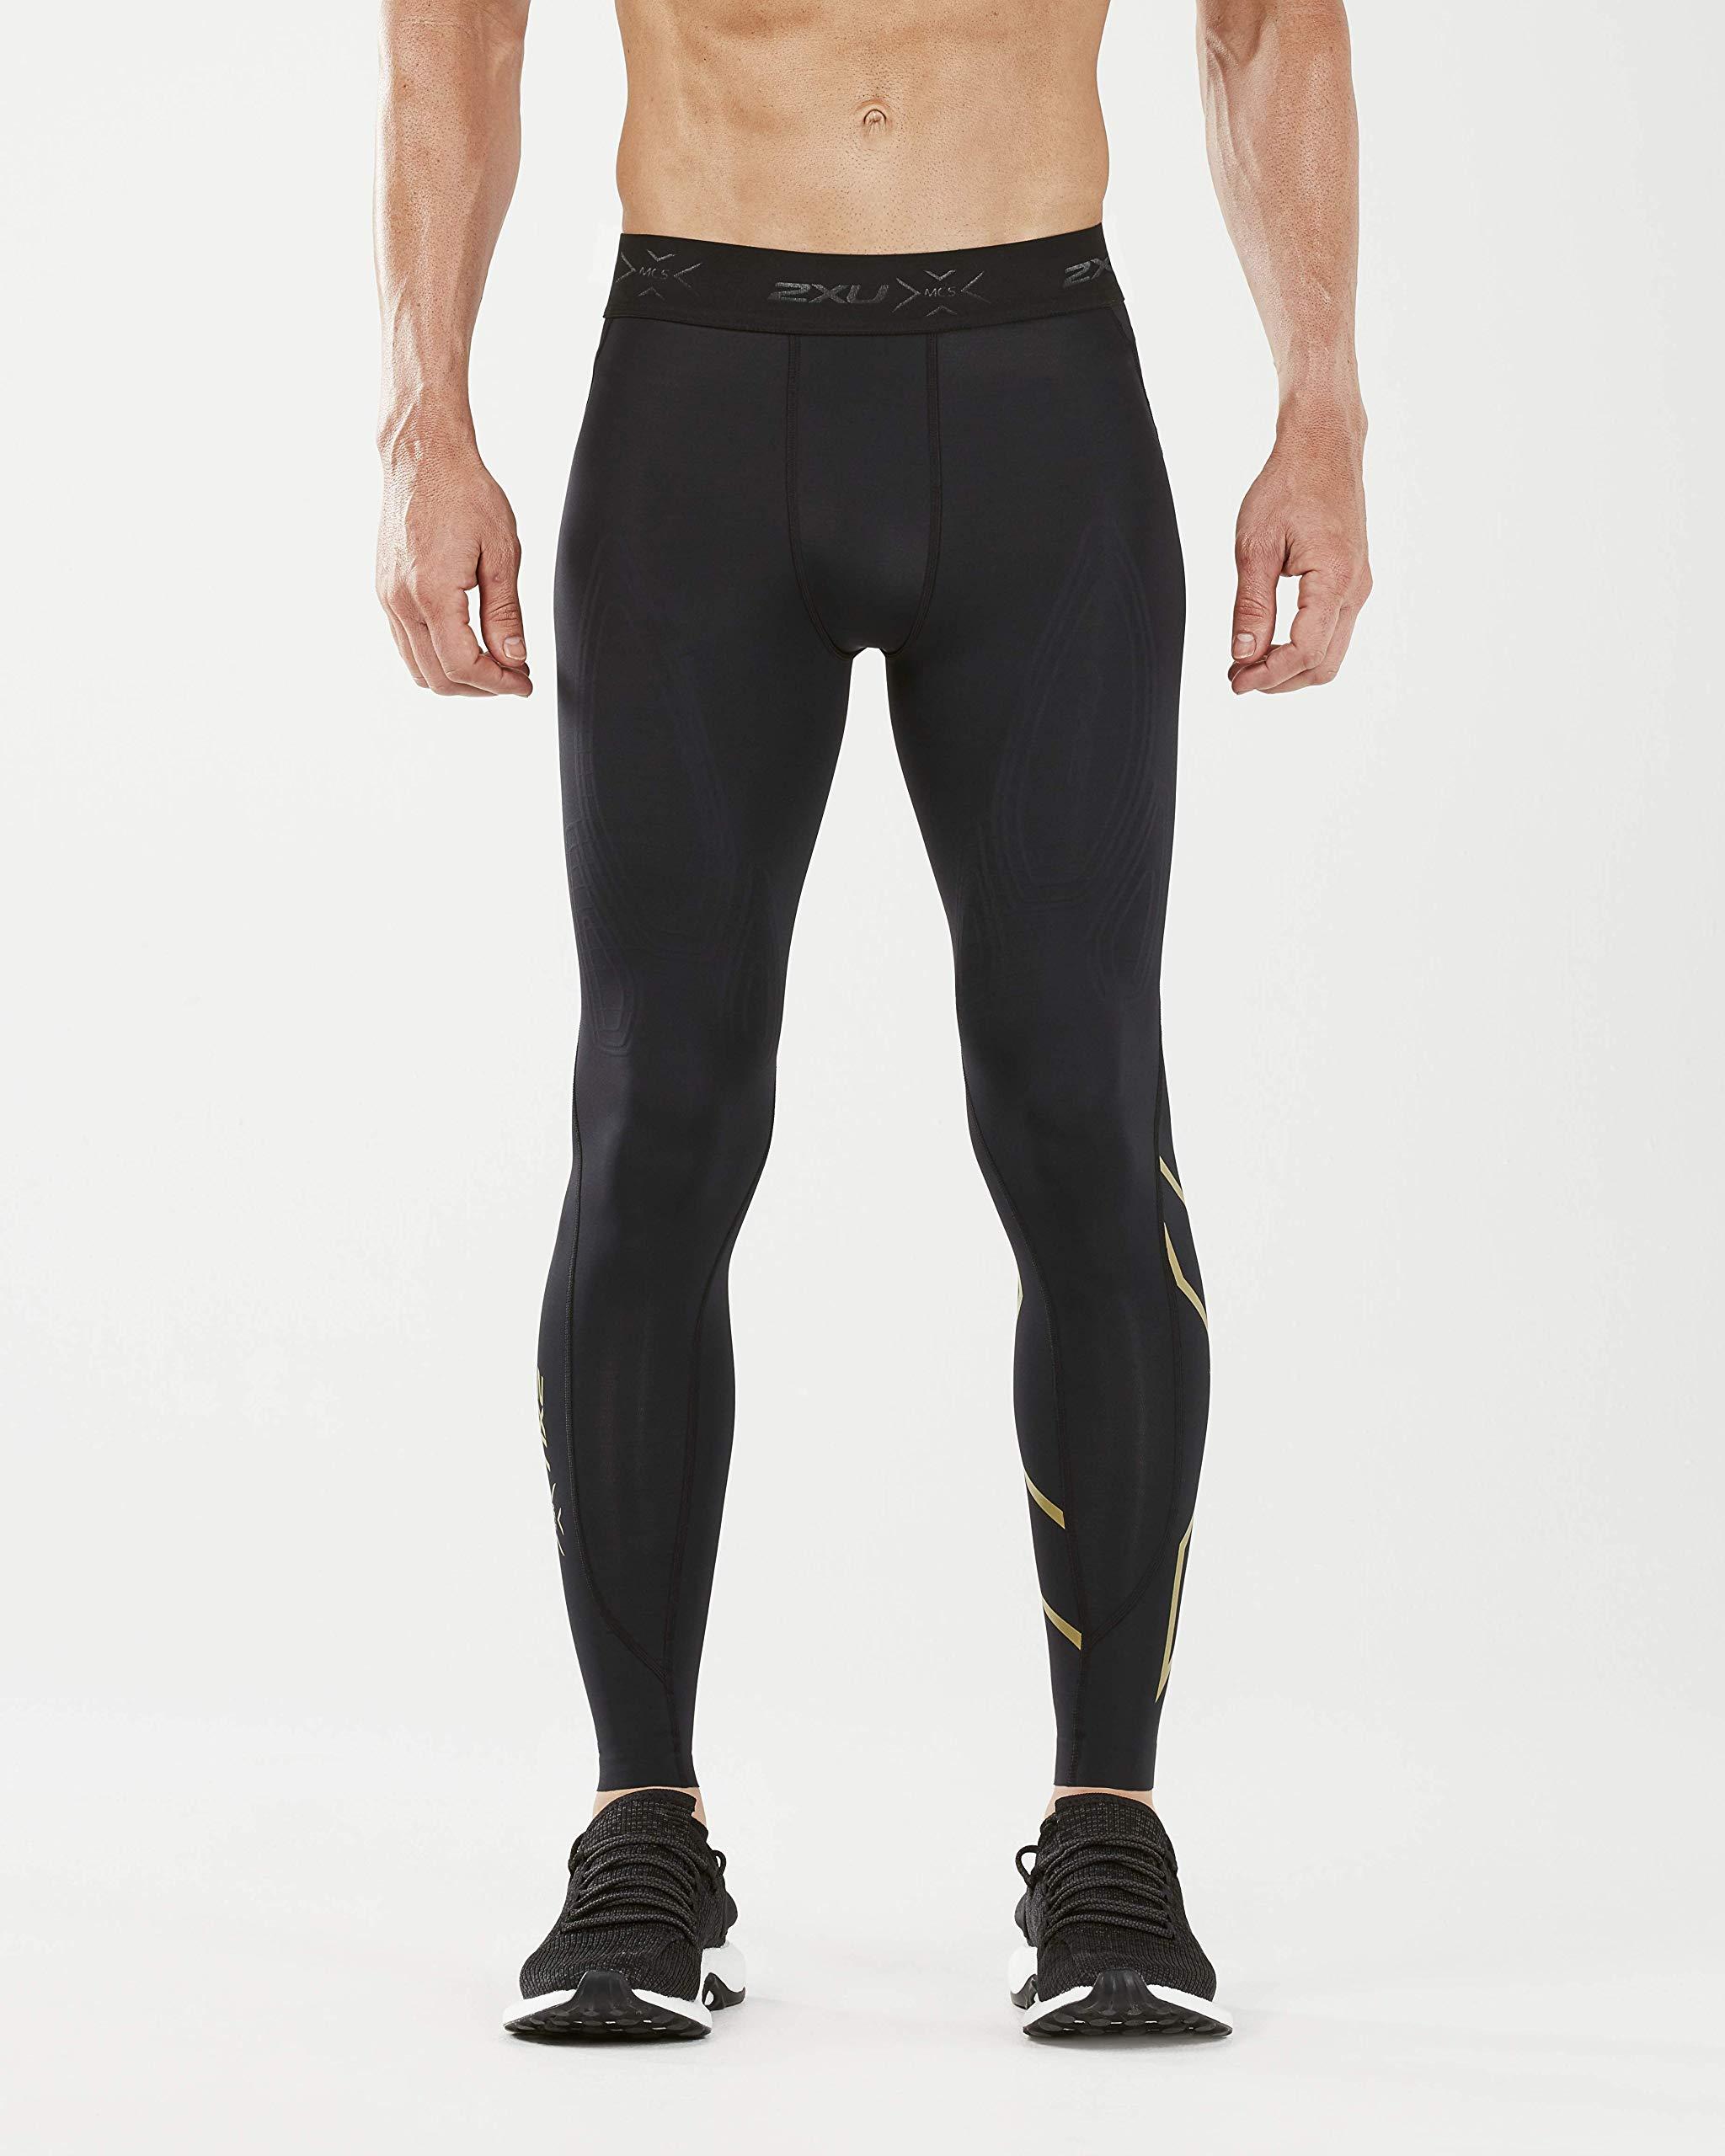 2XU MCS x Training Comp Tights, Black/Gold, x Small